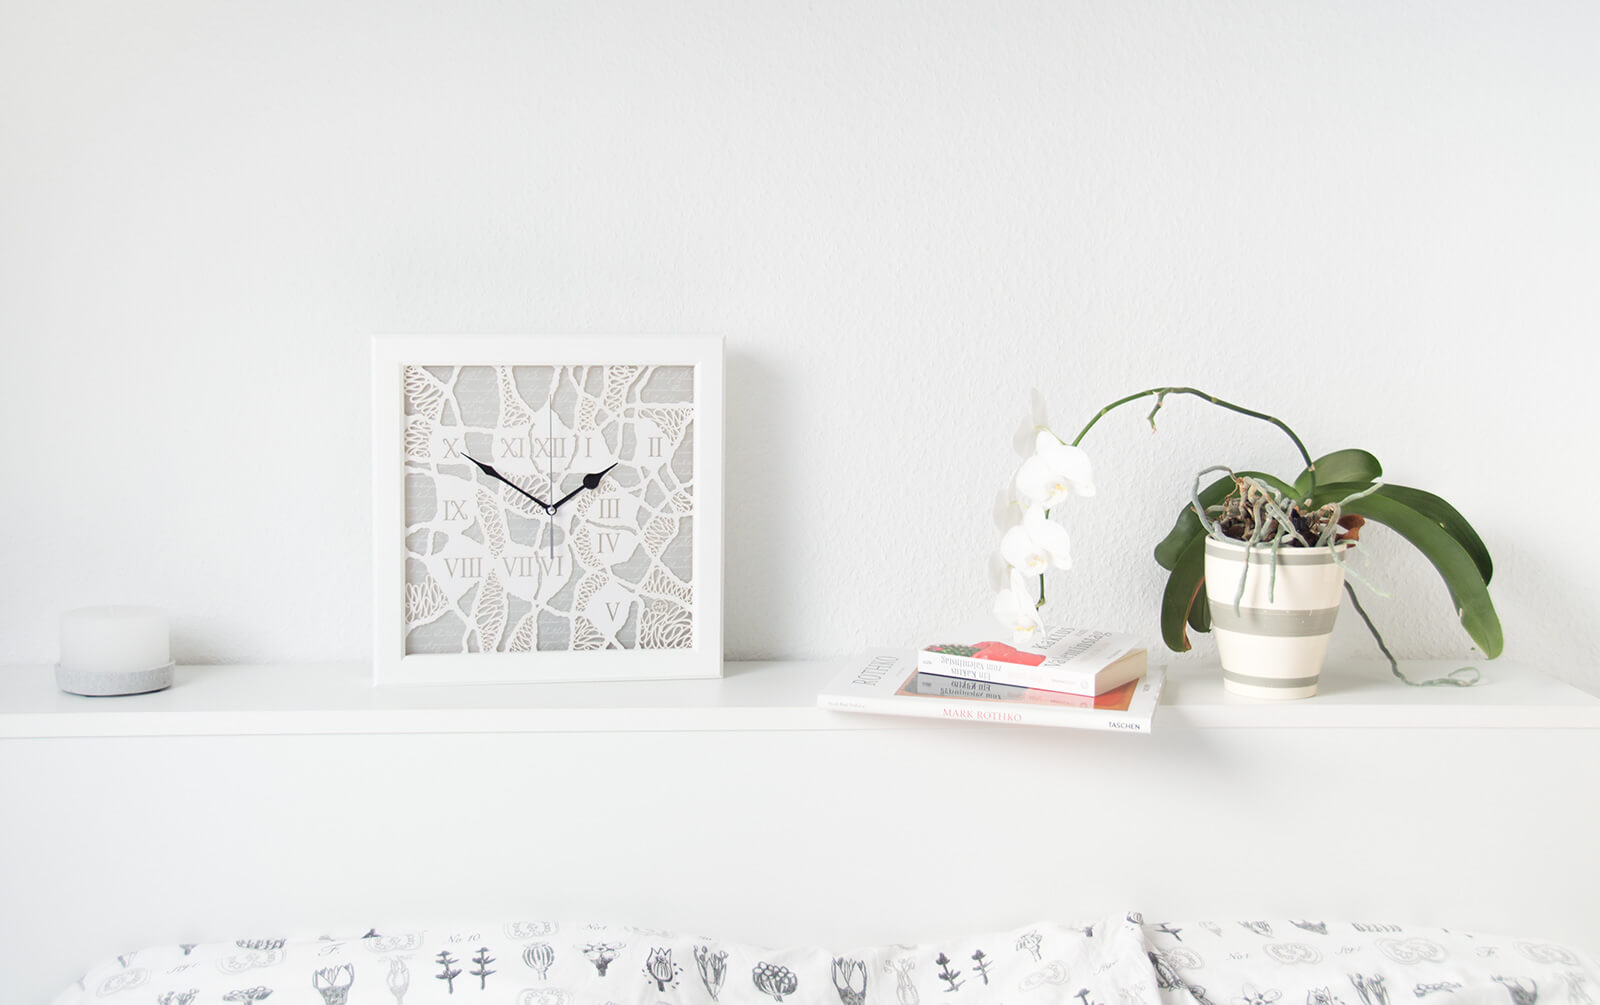 originelle wanduhr mit beleuchtung antarktika wanduhren design atelier. Black Bedroom Furniture Sets. Home Design Ideas